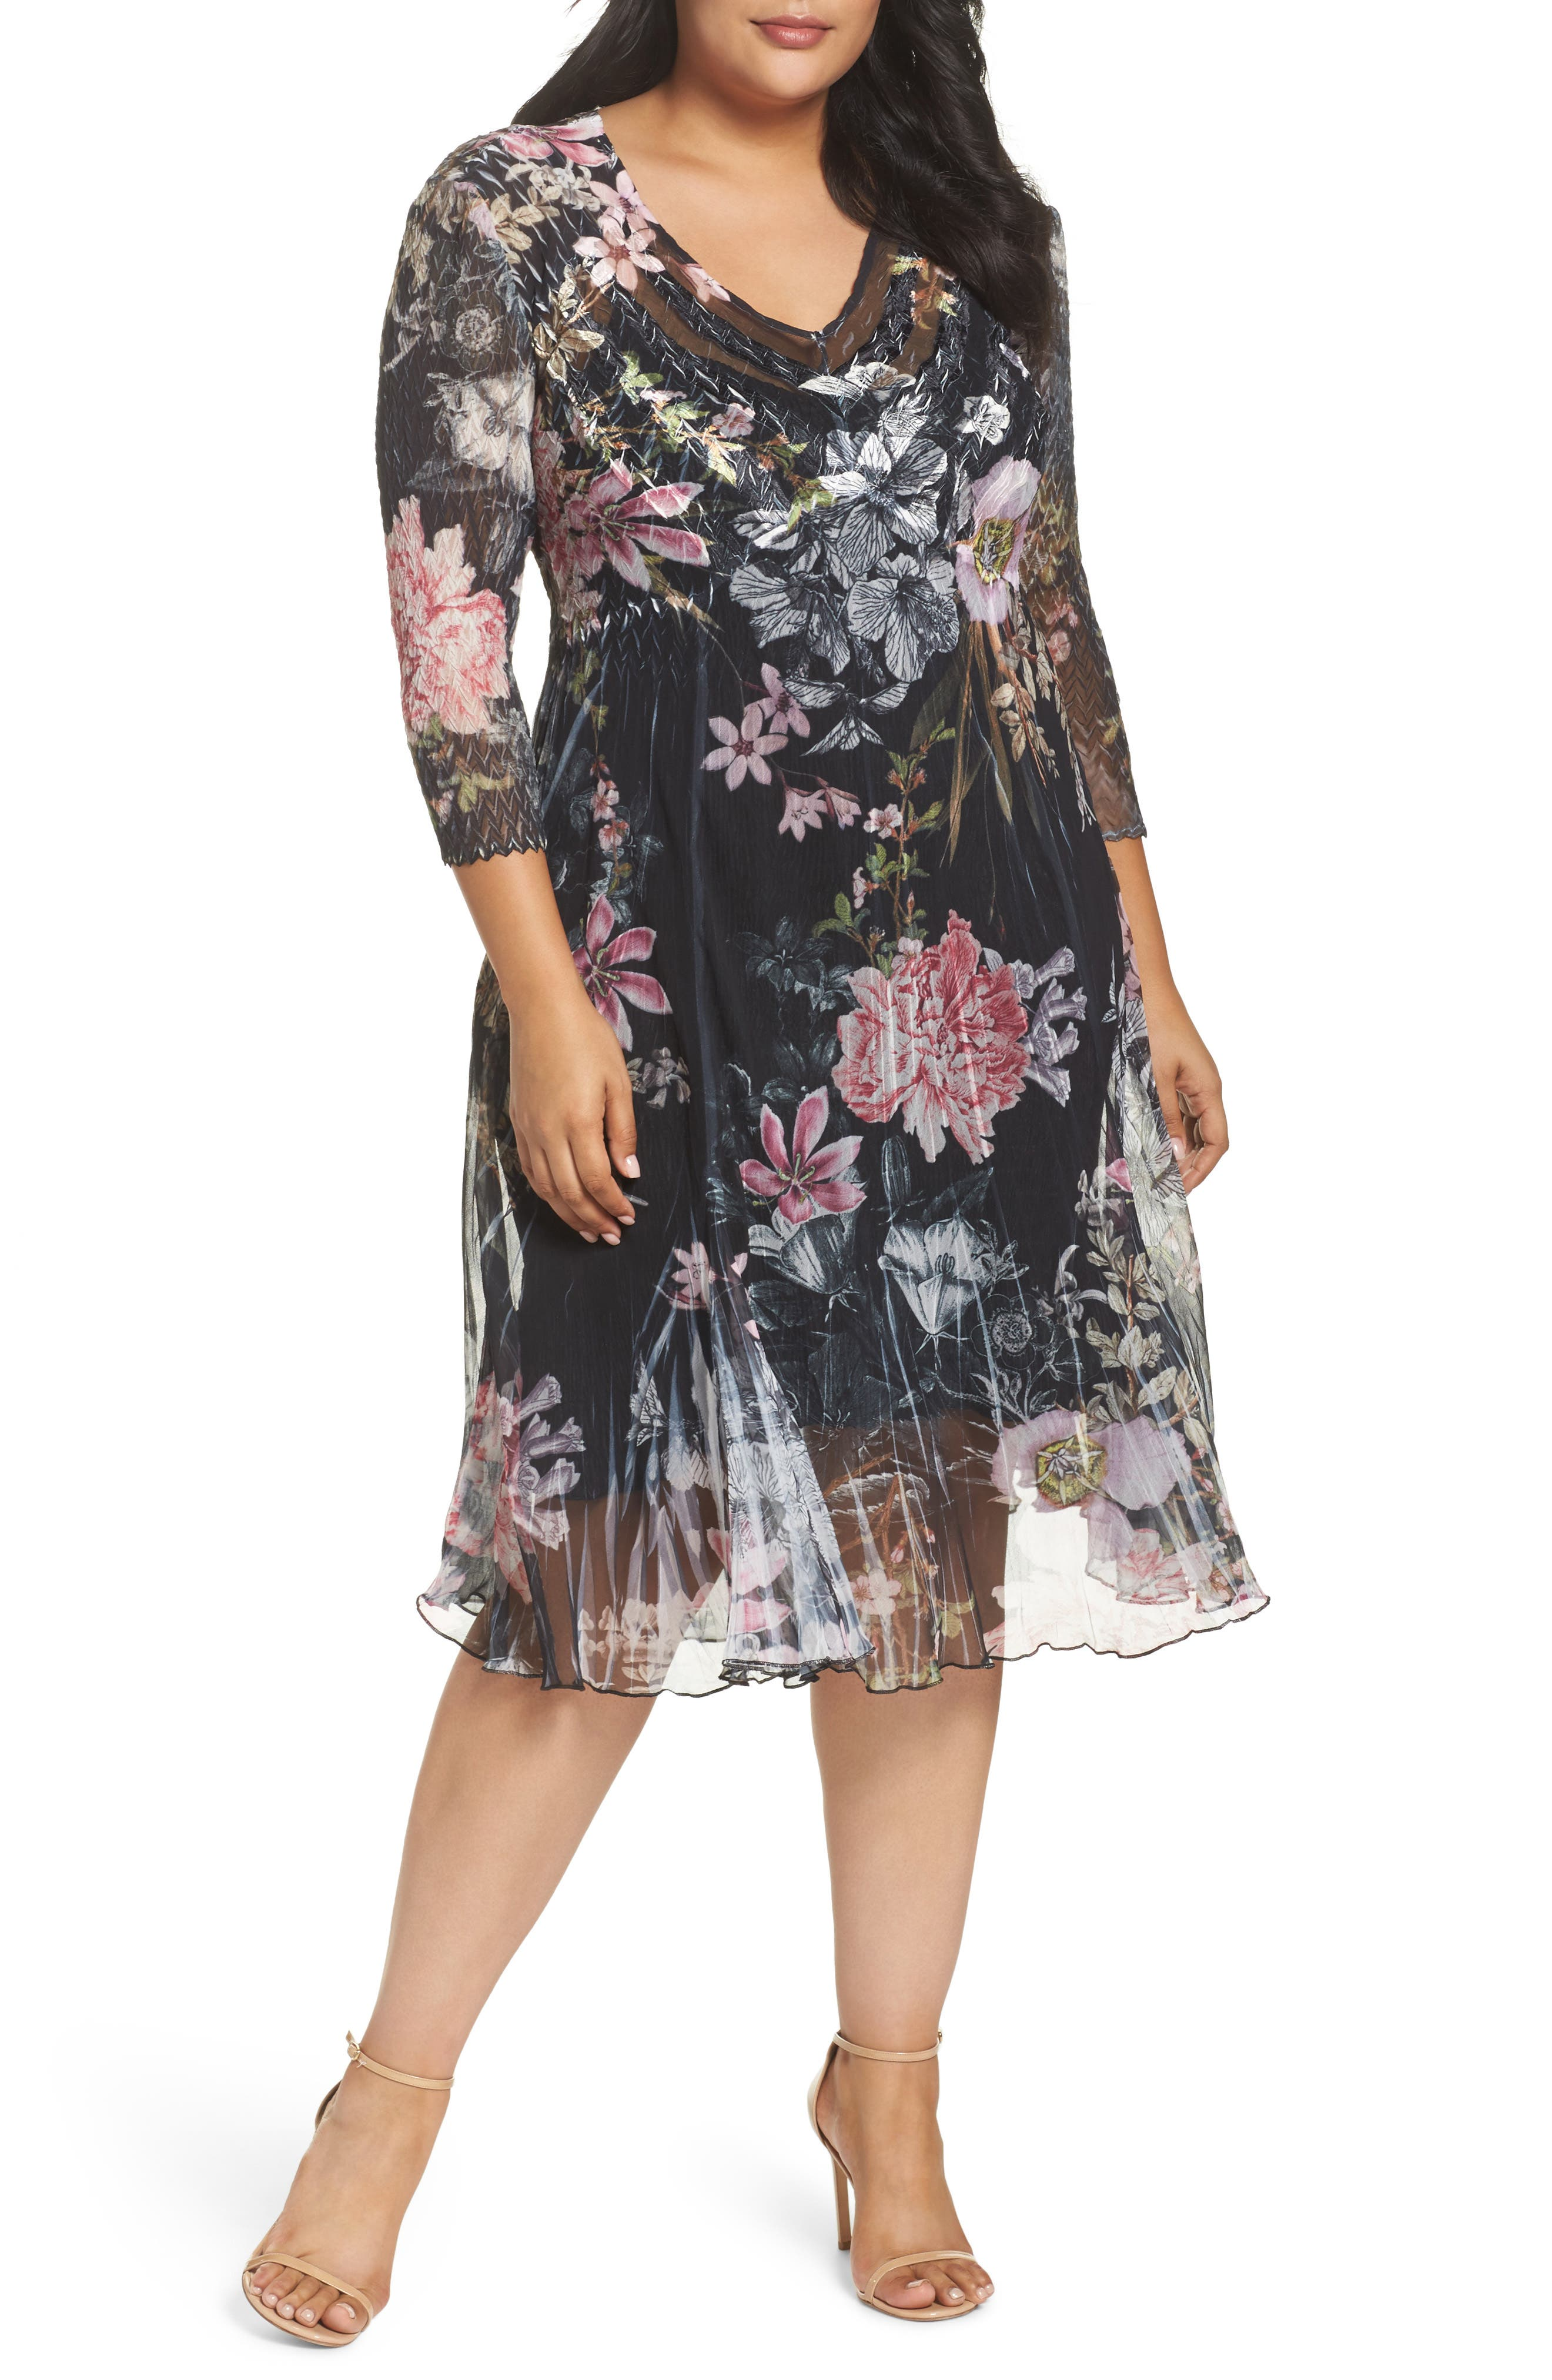 Kamarov Floral Charmeuse & Chiffon Floral A-Line Dress,                         Main,                         color, Moon Flower